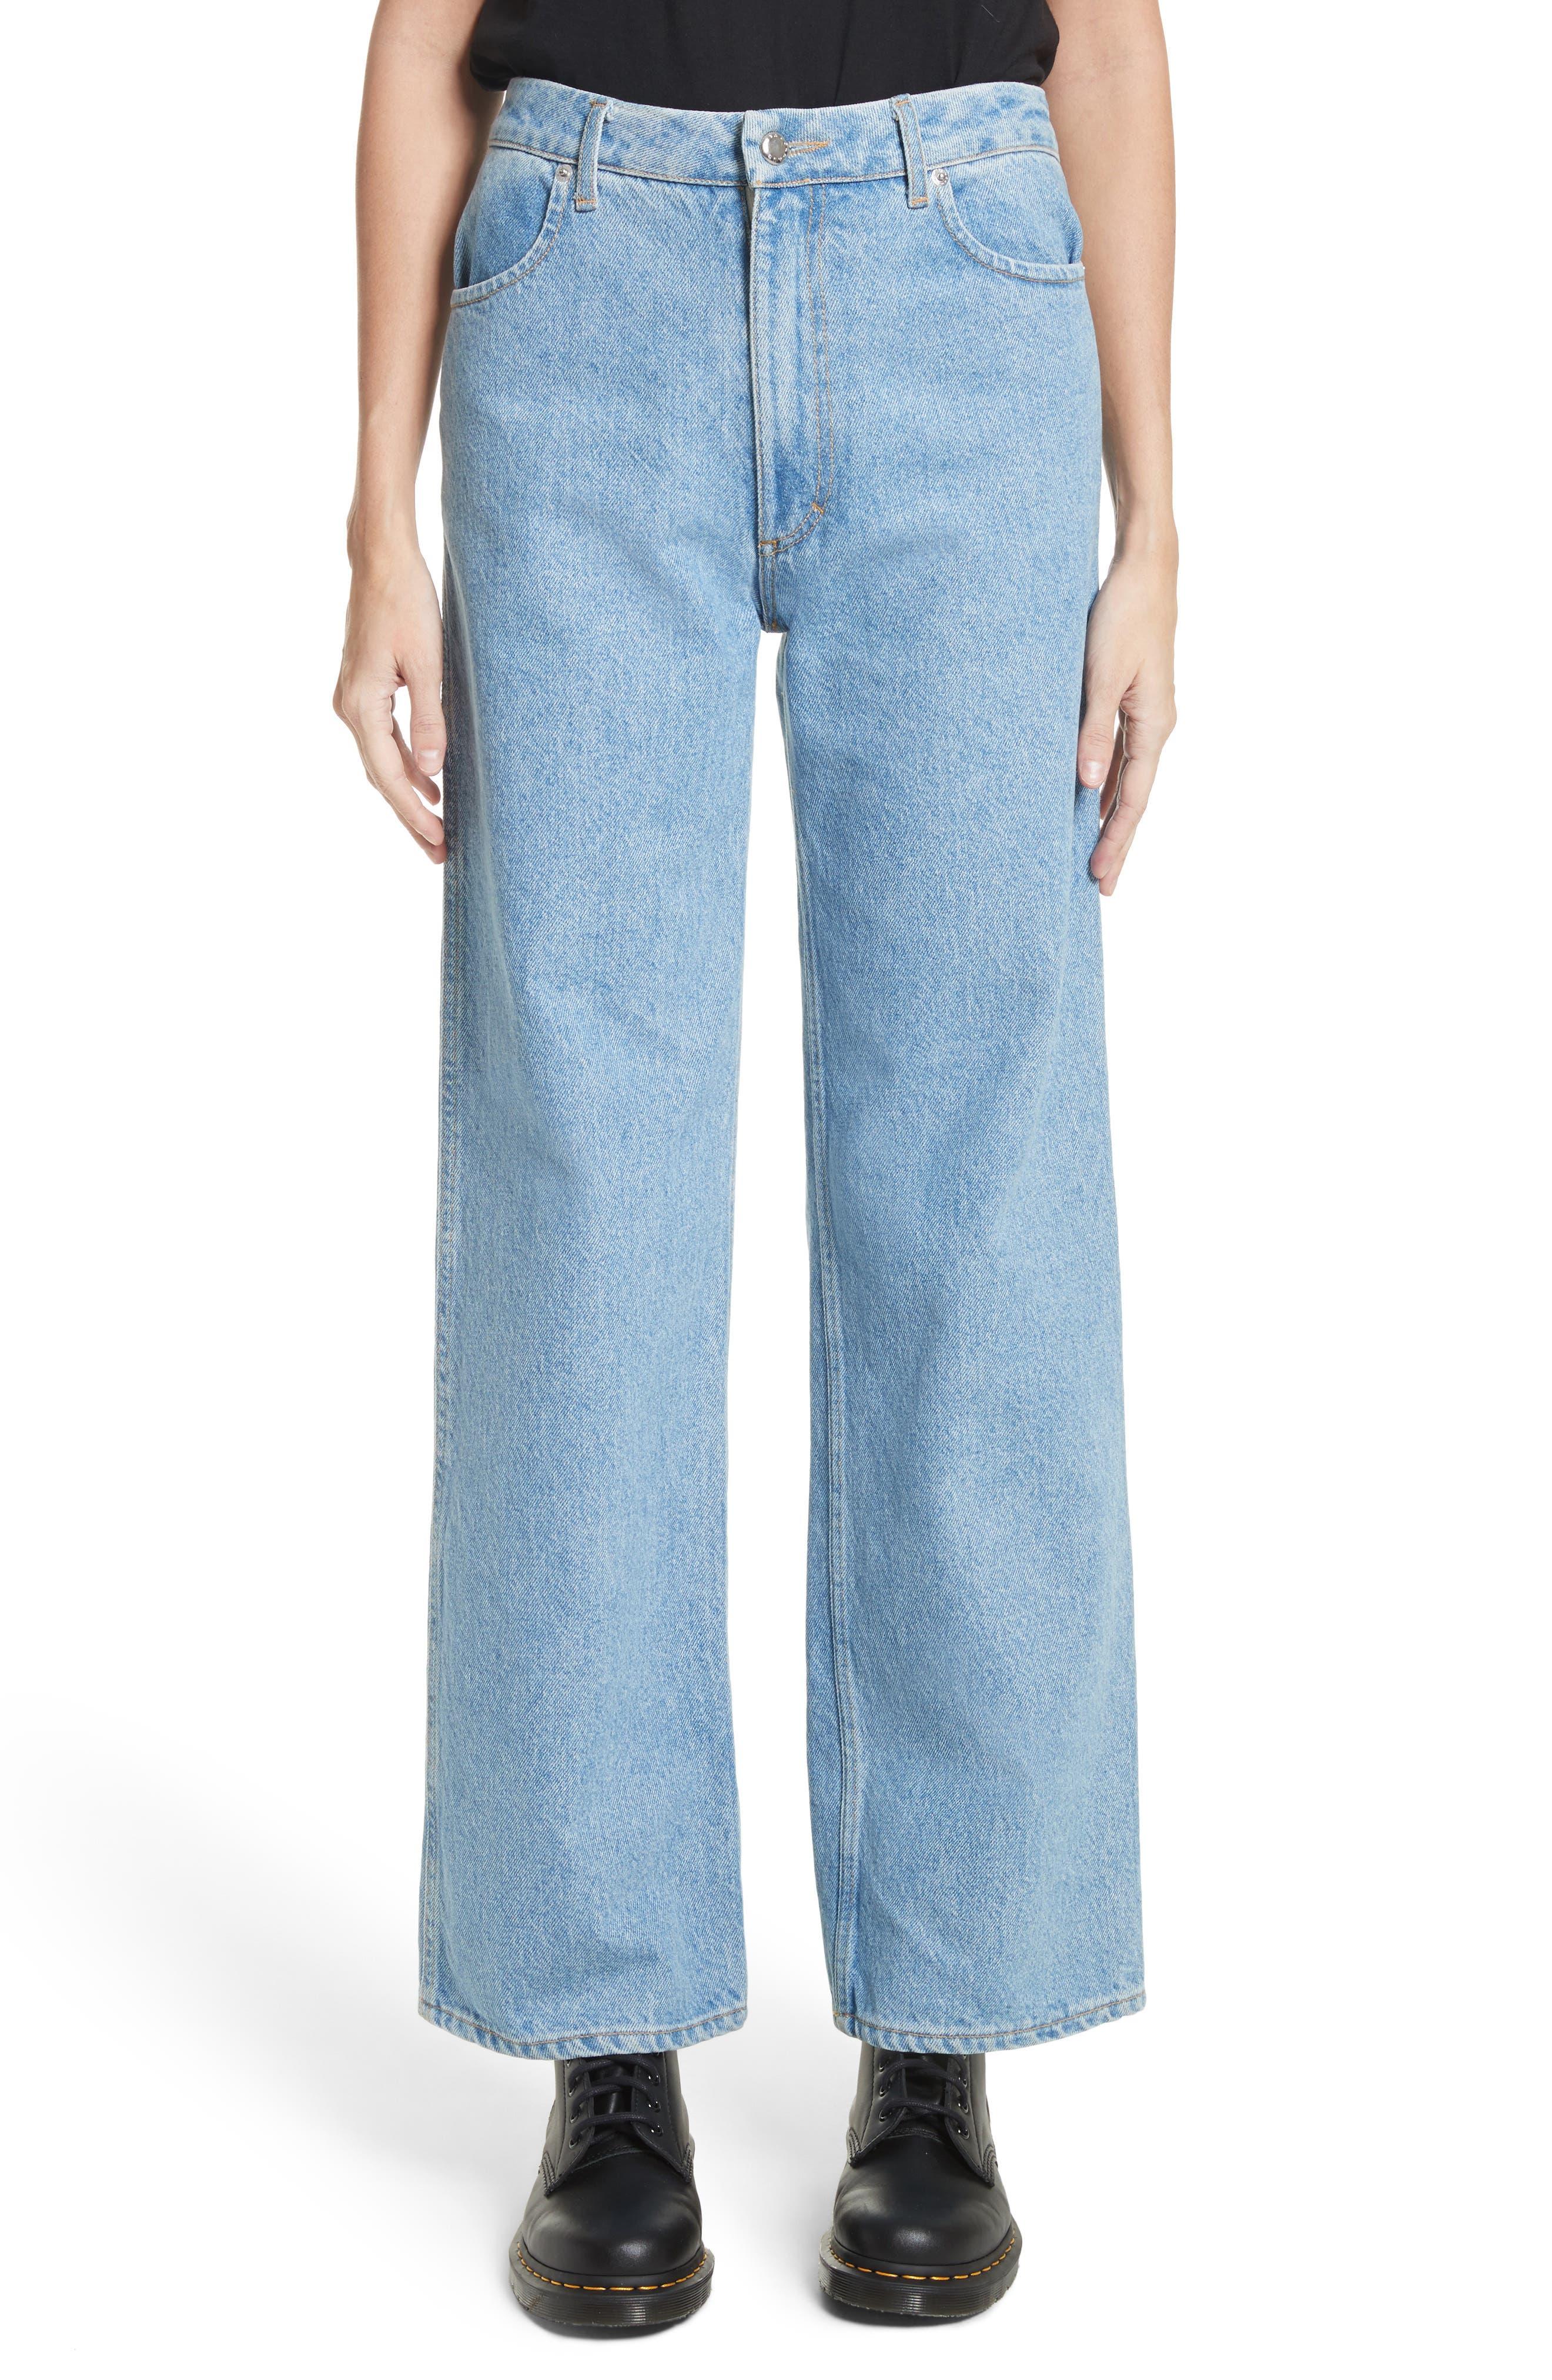 EL Wide Leg Jeans,                         Main,                         color, True Blue